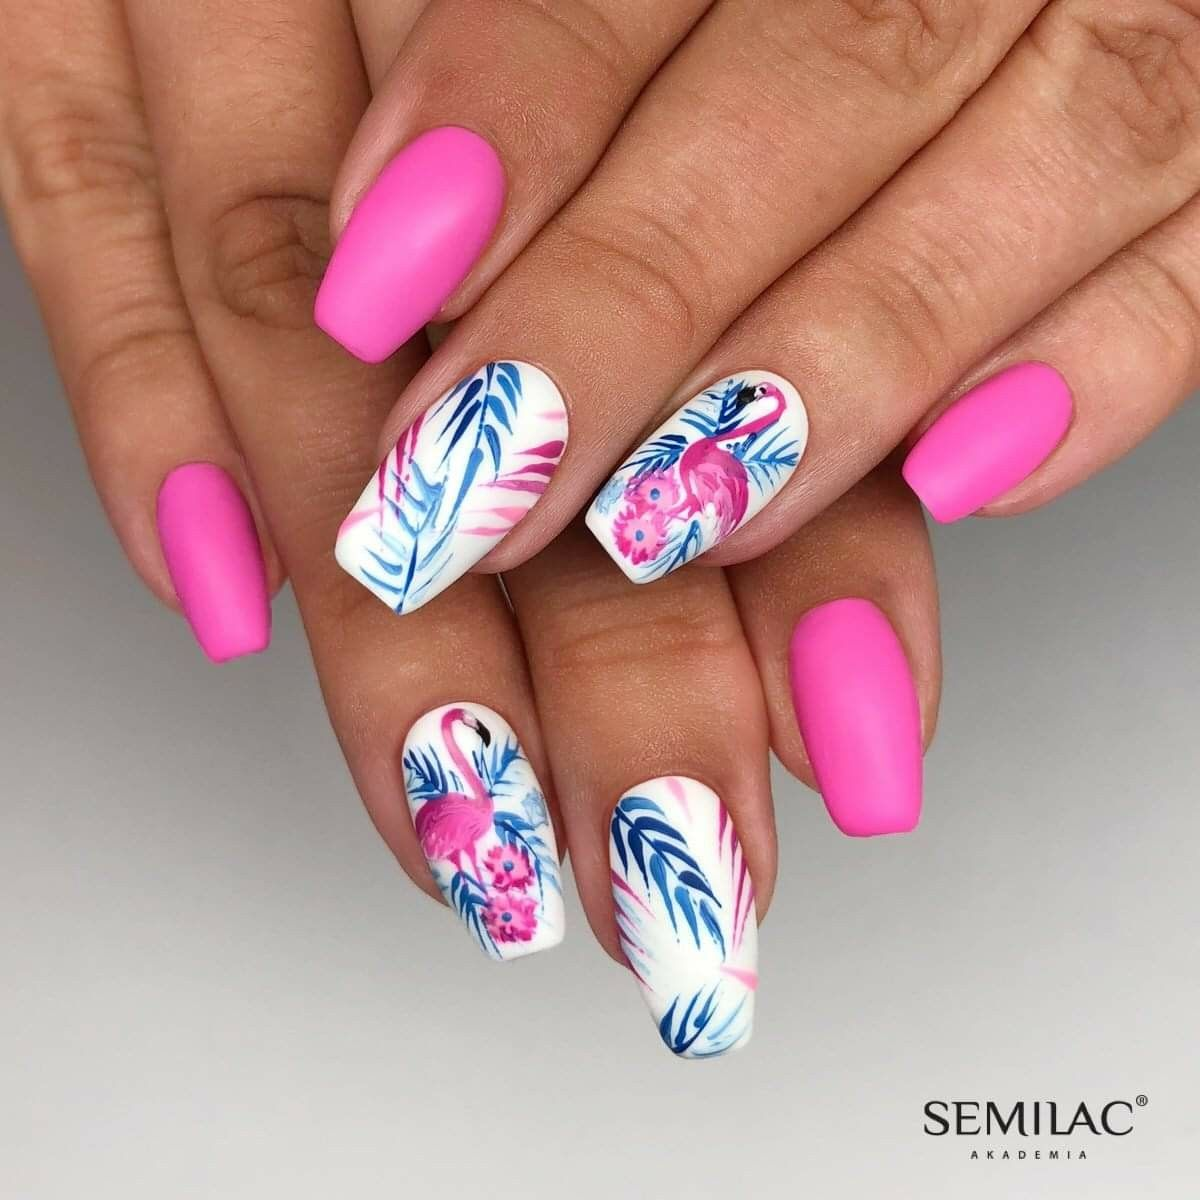 Pin By Tynka Korotvickova On Nails Flamingo Nails Cute Acrylic Nails Tropical Nails